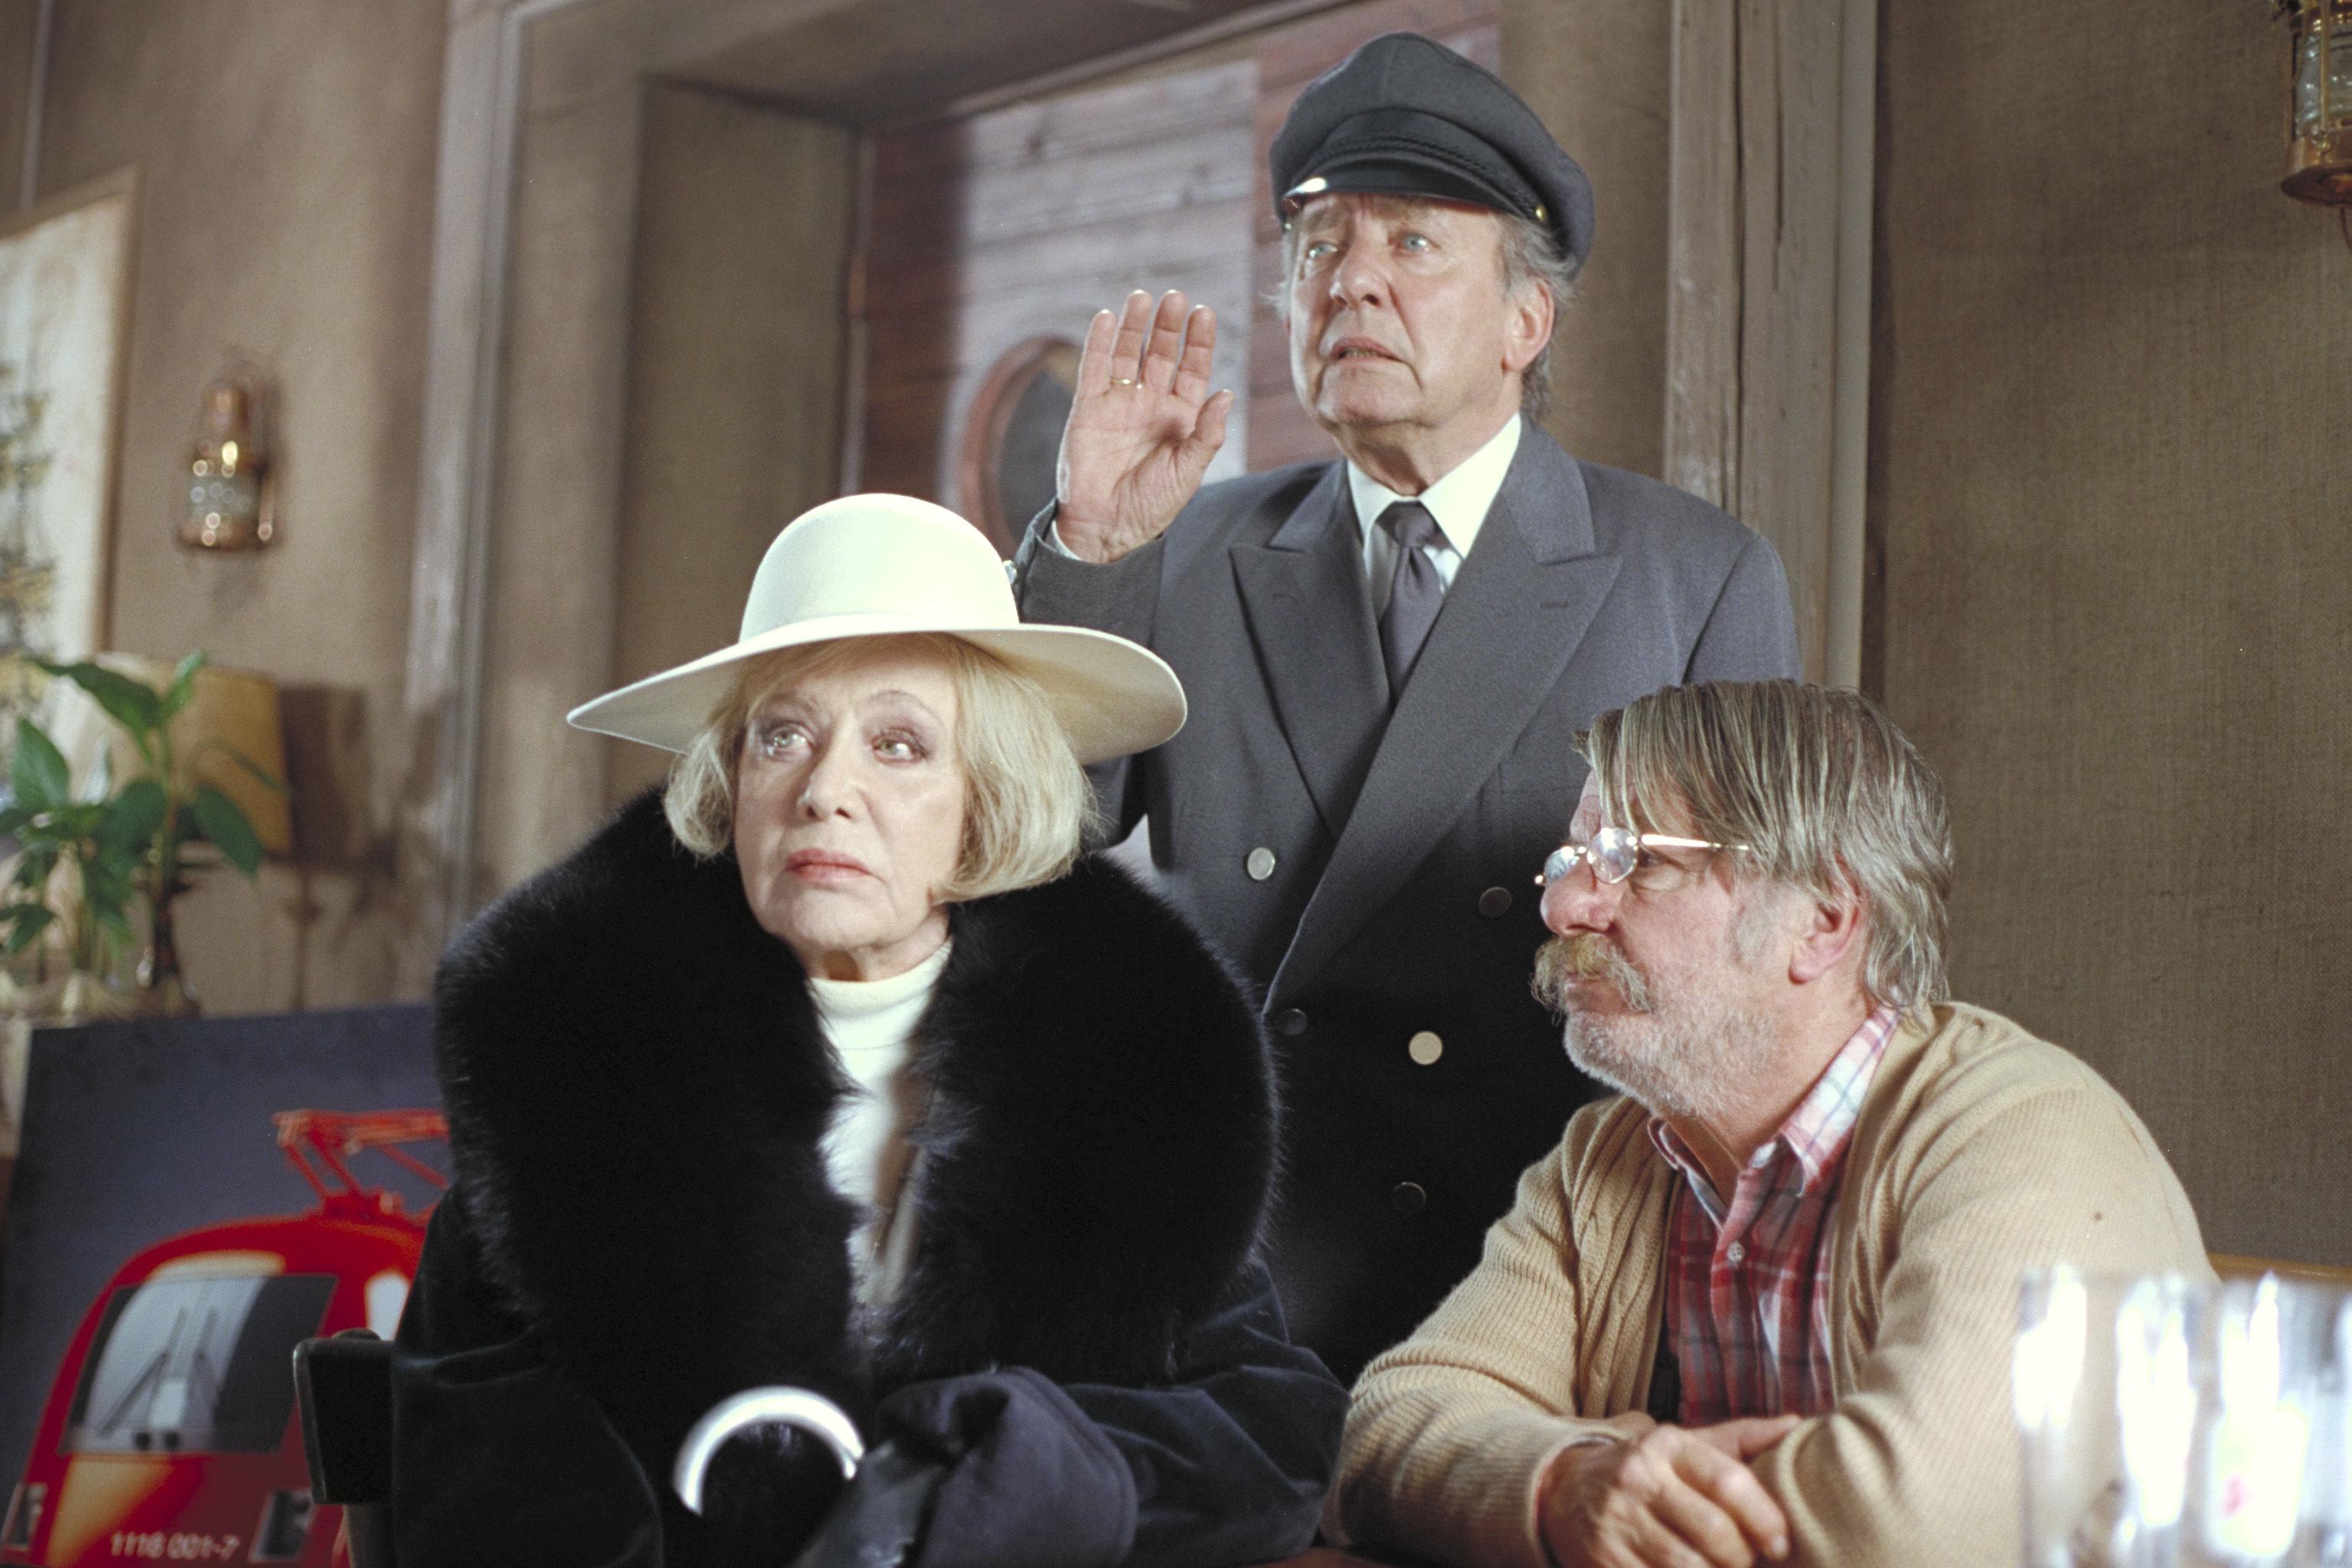 Hildegard Knef (Tante Marlene), Hans Clarin, Heinz Petters (Sigis Opa)